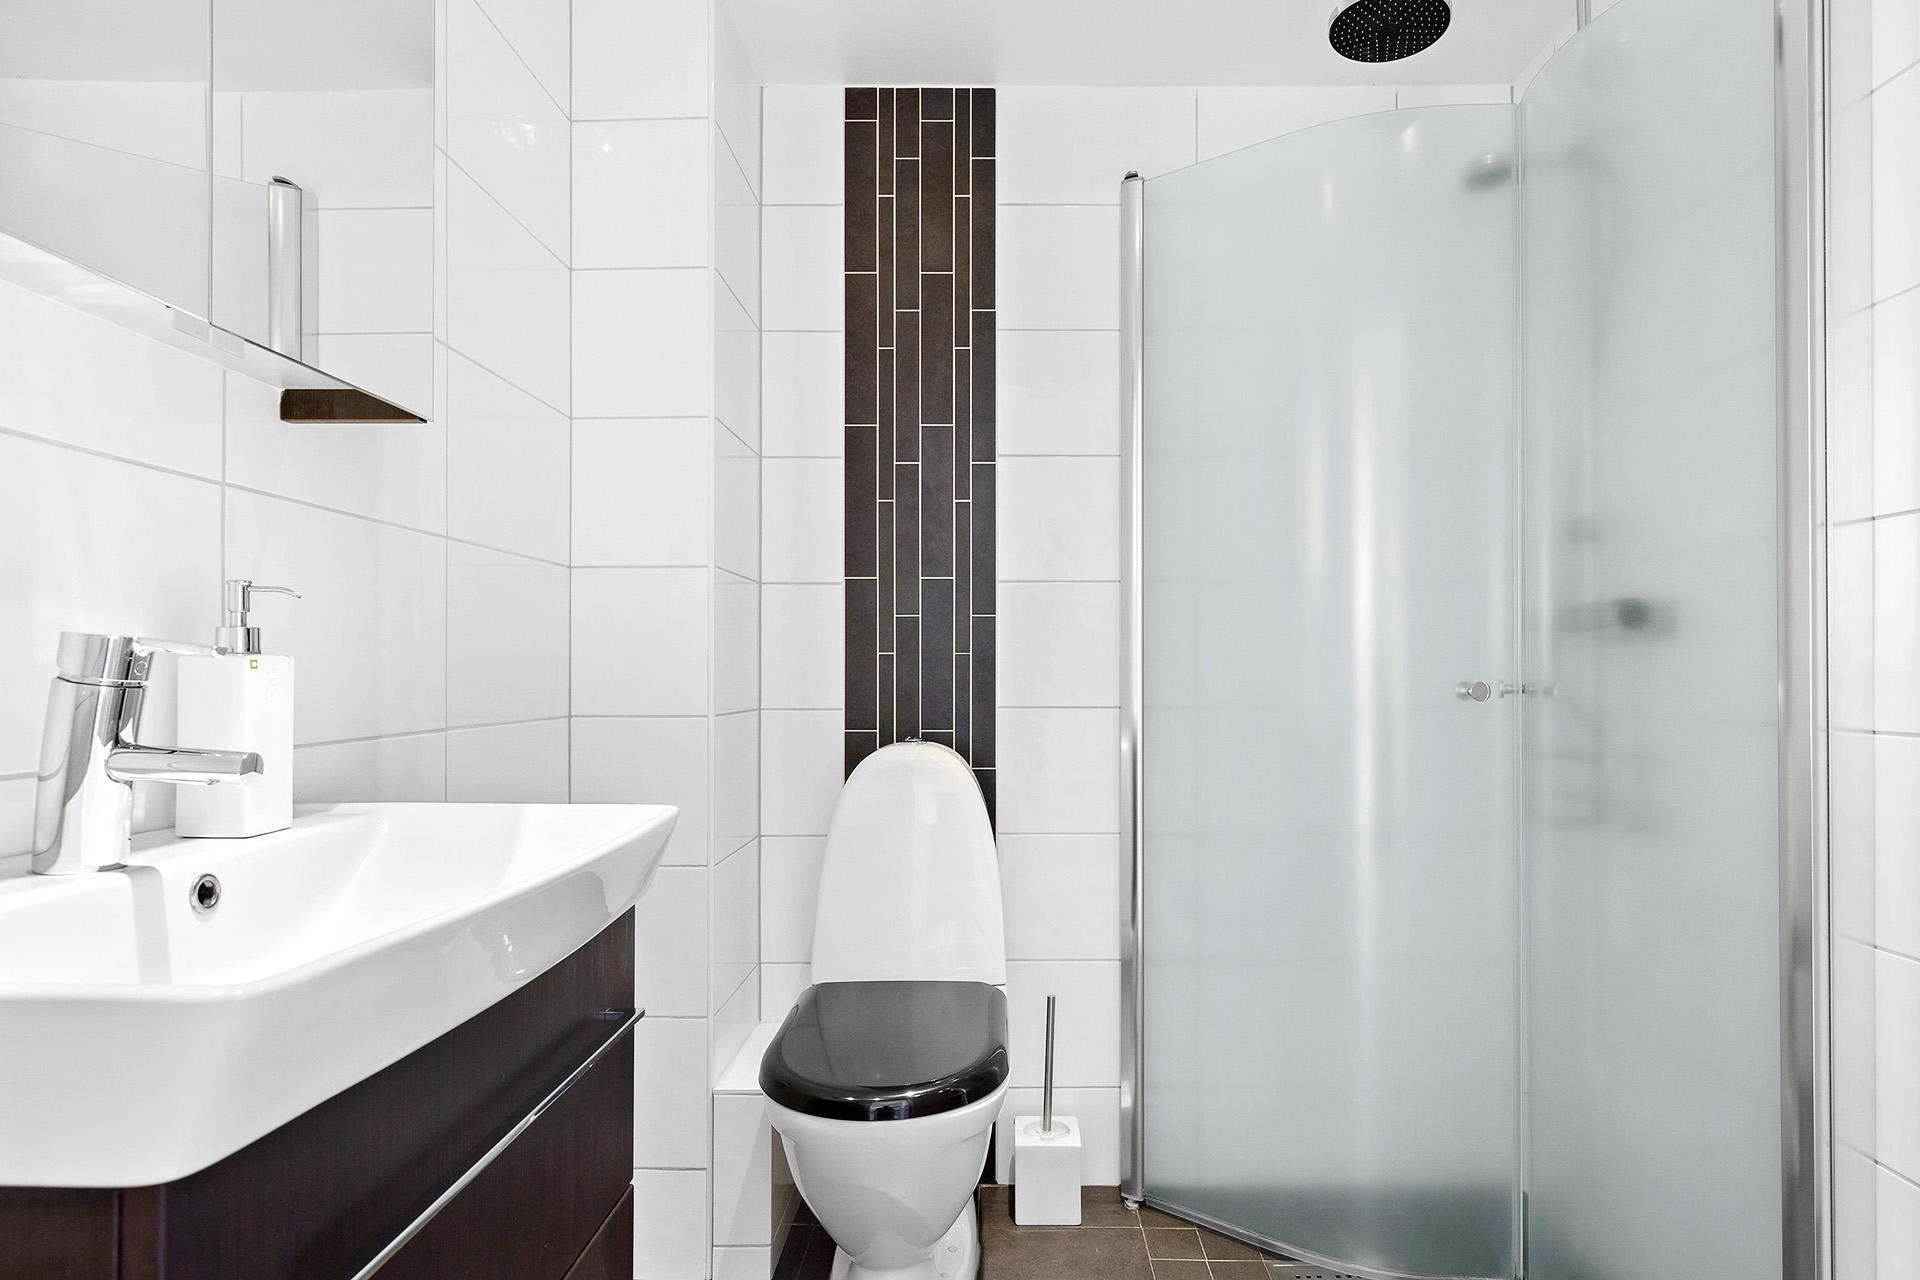 Helkaklat duschrum från 2012